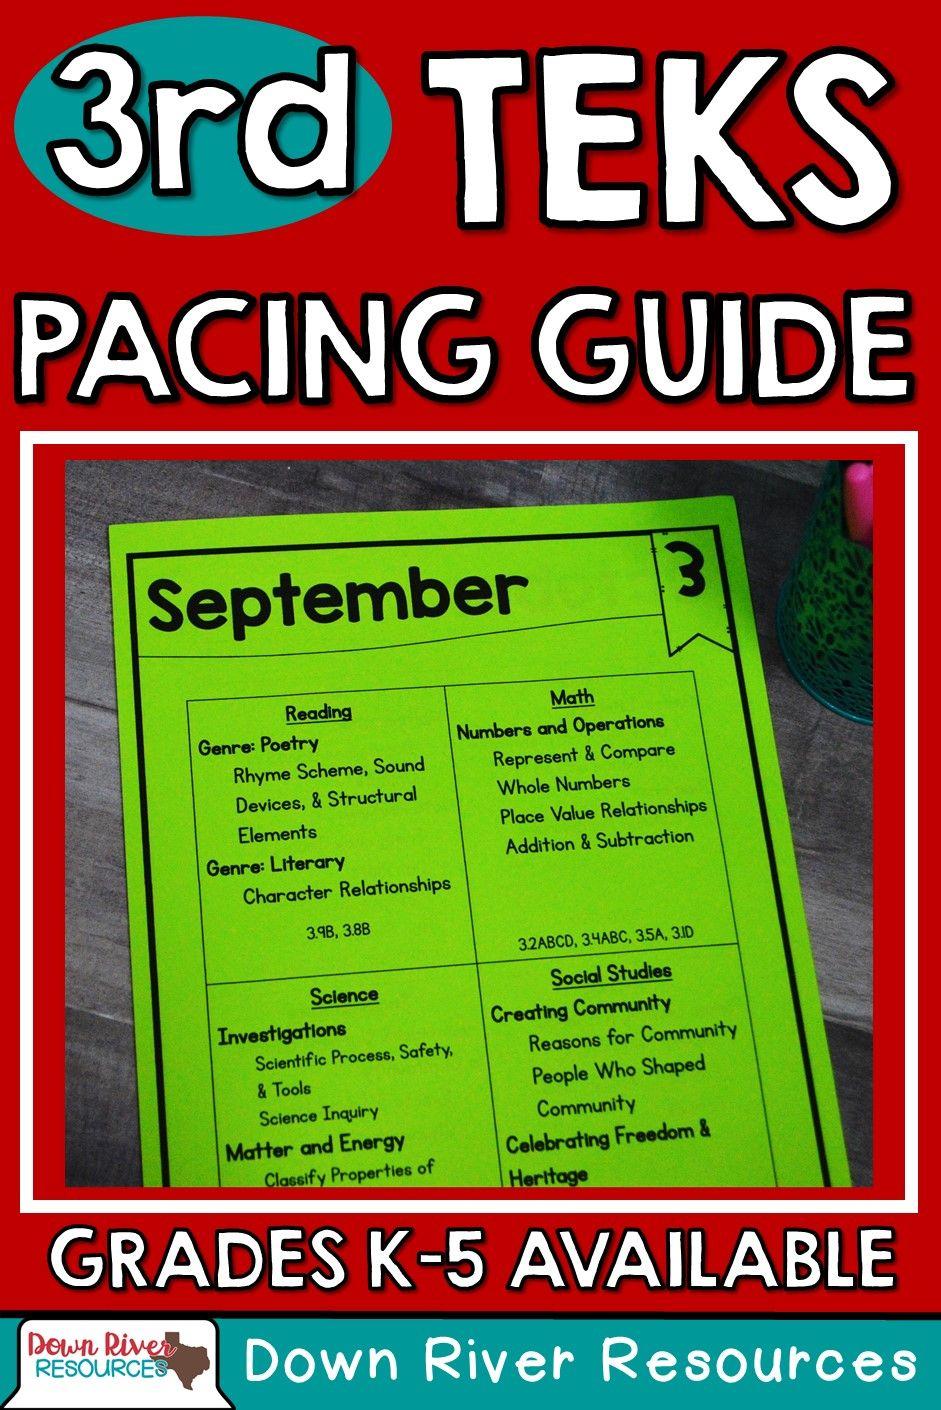 Third Grade Pacing Guide | Pacing Guide Third Grade | Pacing Guide for  Third Grade | Third Grade TEKS Pacing Guide | Third Grade TEKS | Third Grade  Back to ...